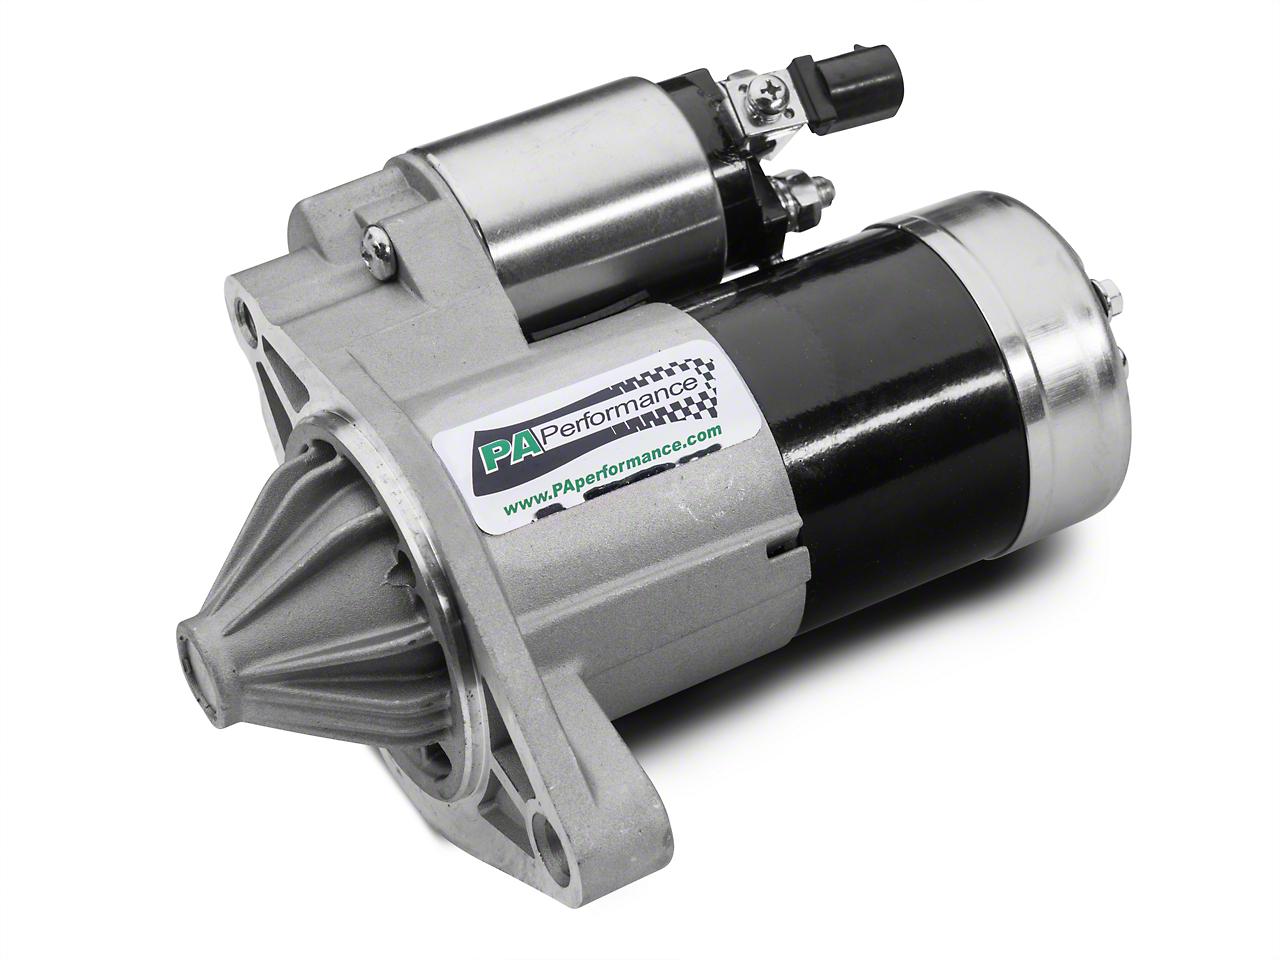 PA Performance Starter (99-01 4.0L Wrangler TJ)